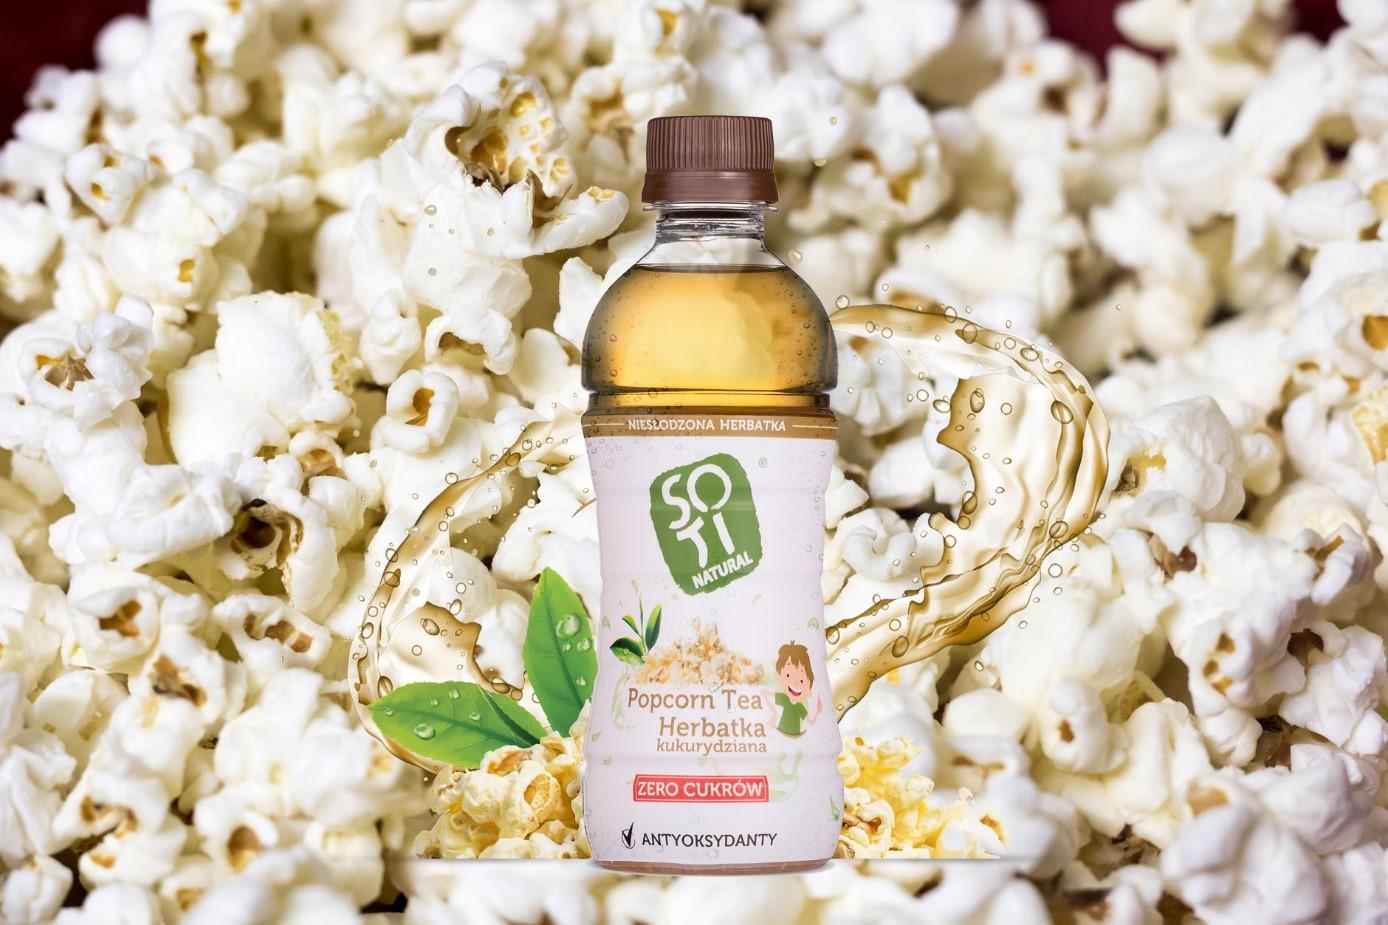 popcorn 2 aranacjajpg